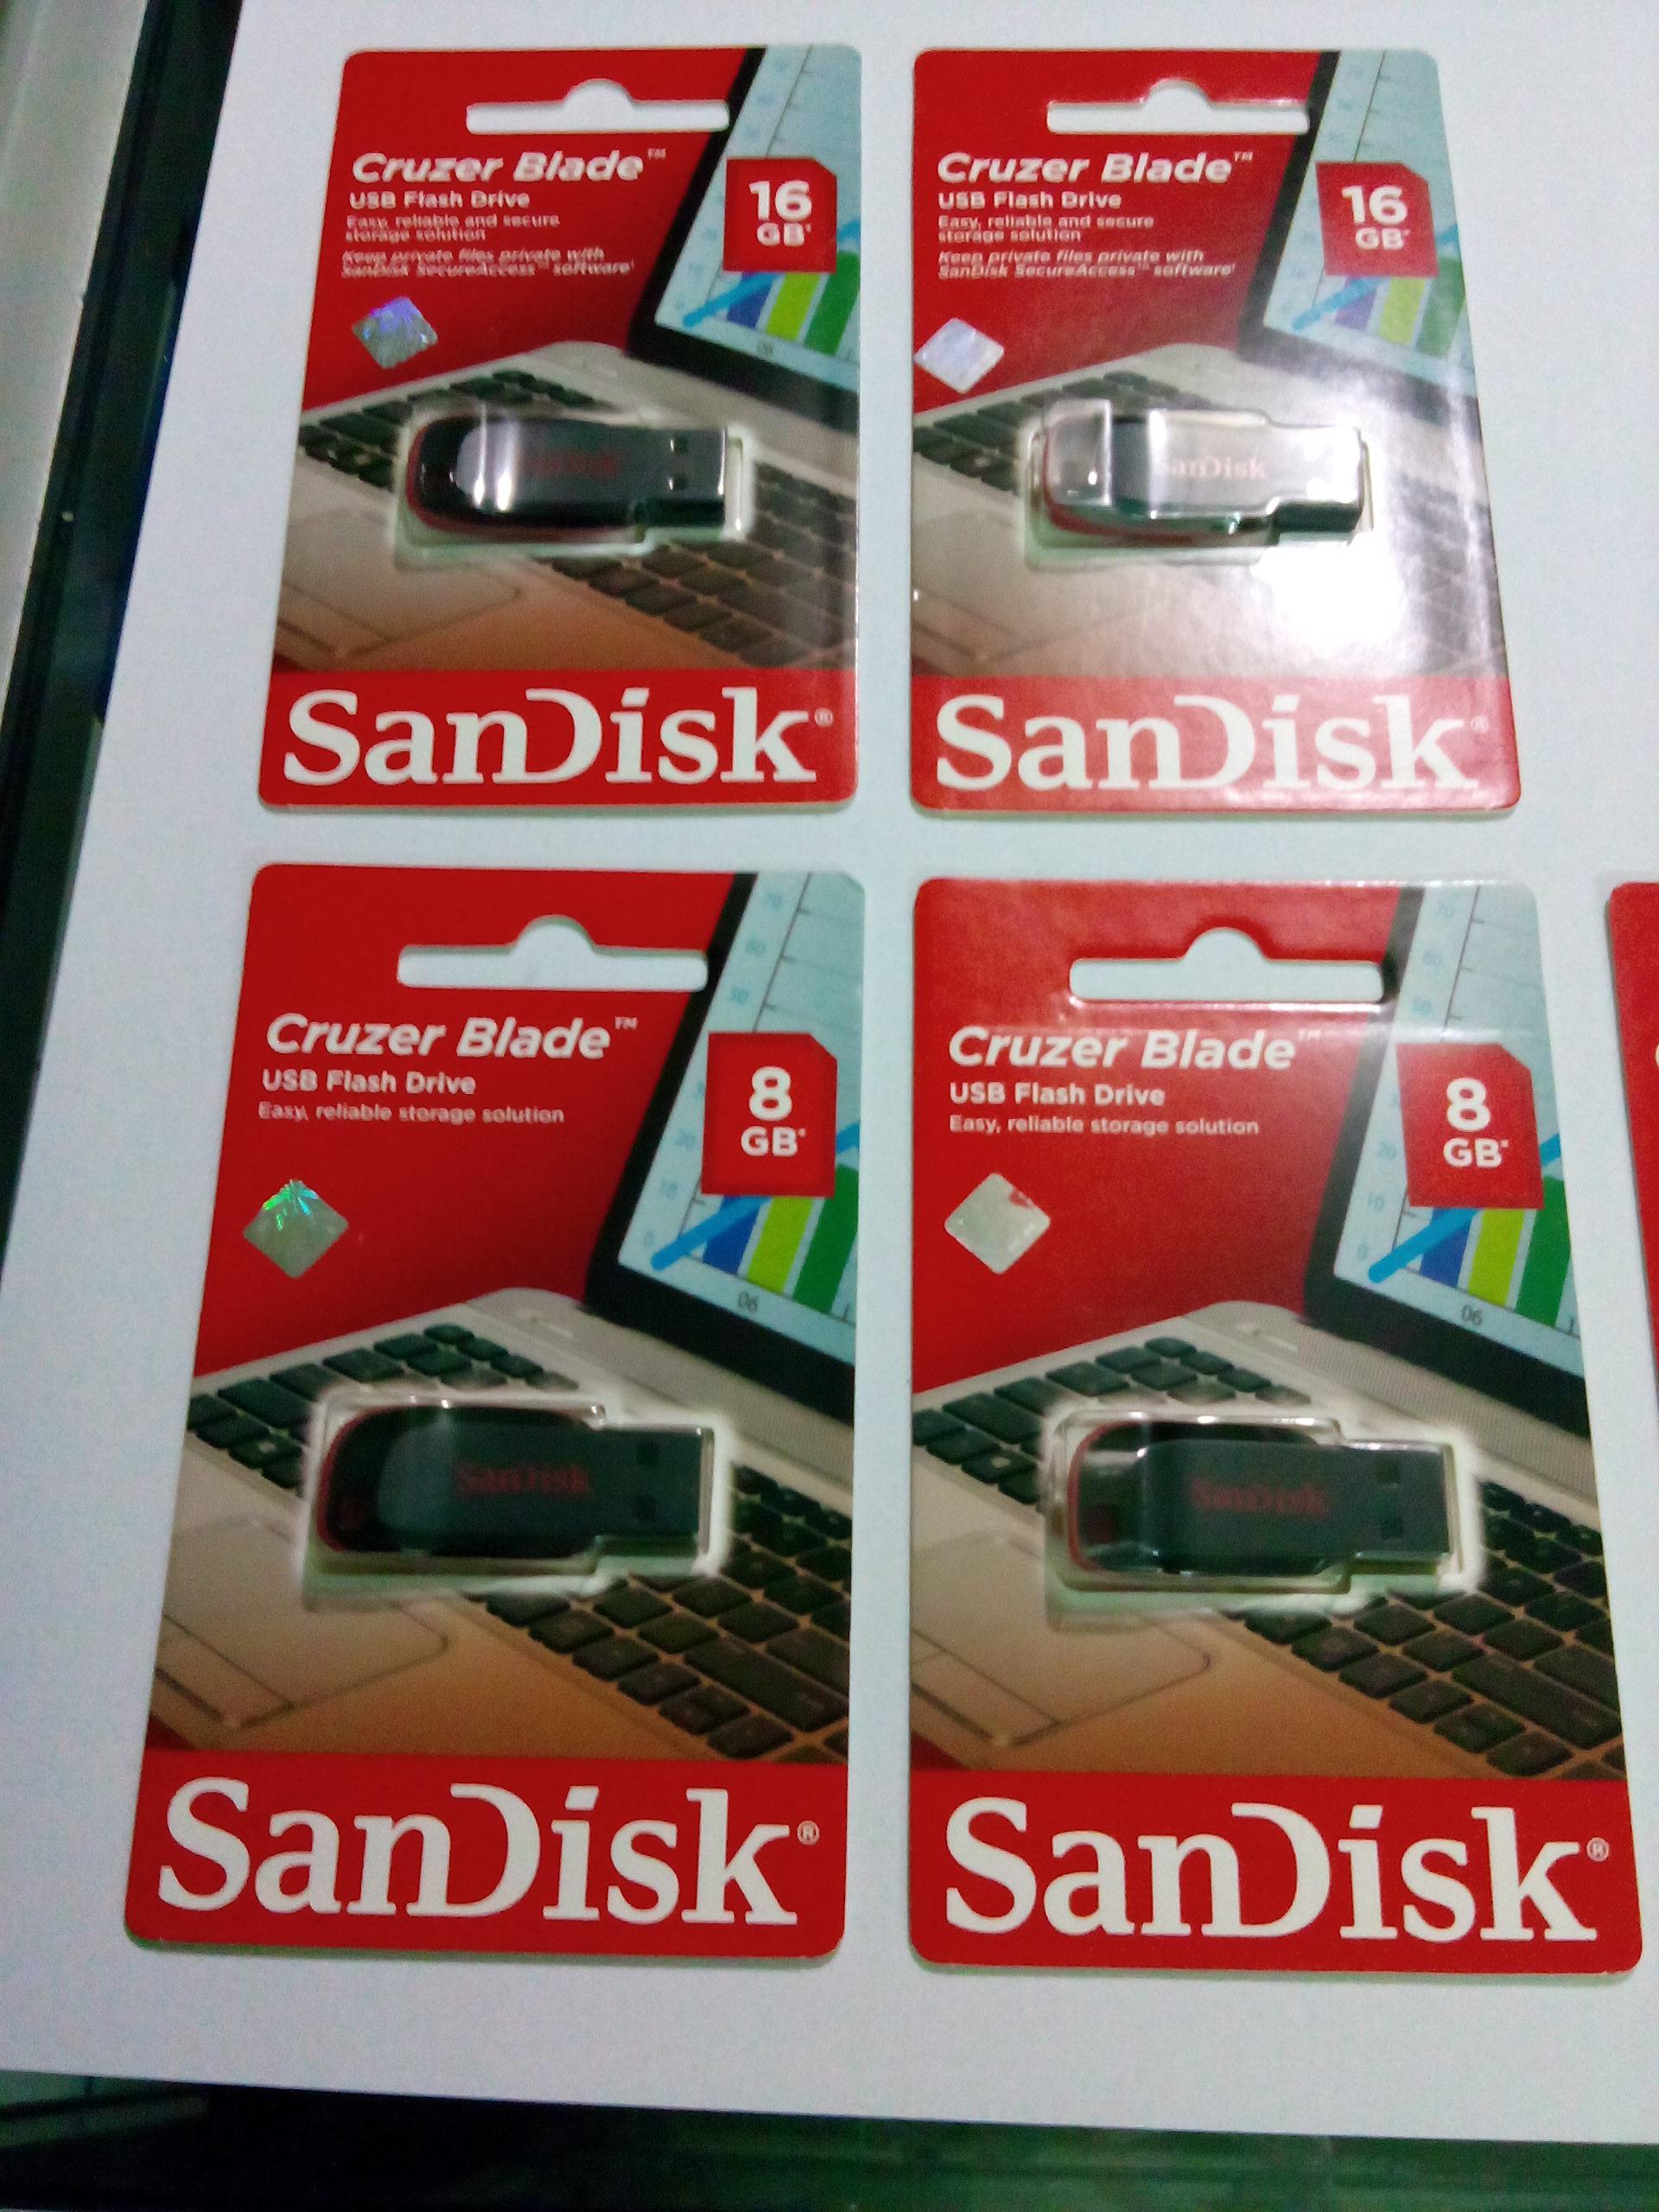 Flashdisk Cruzer Blade Sandisk Original Ekacomputer 16 Gb Jual Storage 16gb Rp 95rb 8gb Rp65rb Img 20150727 181239